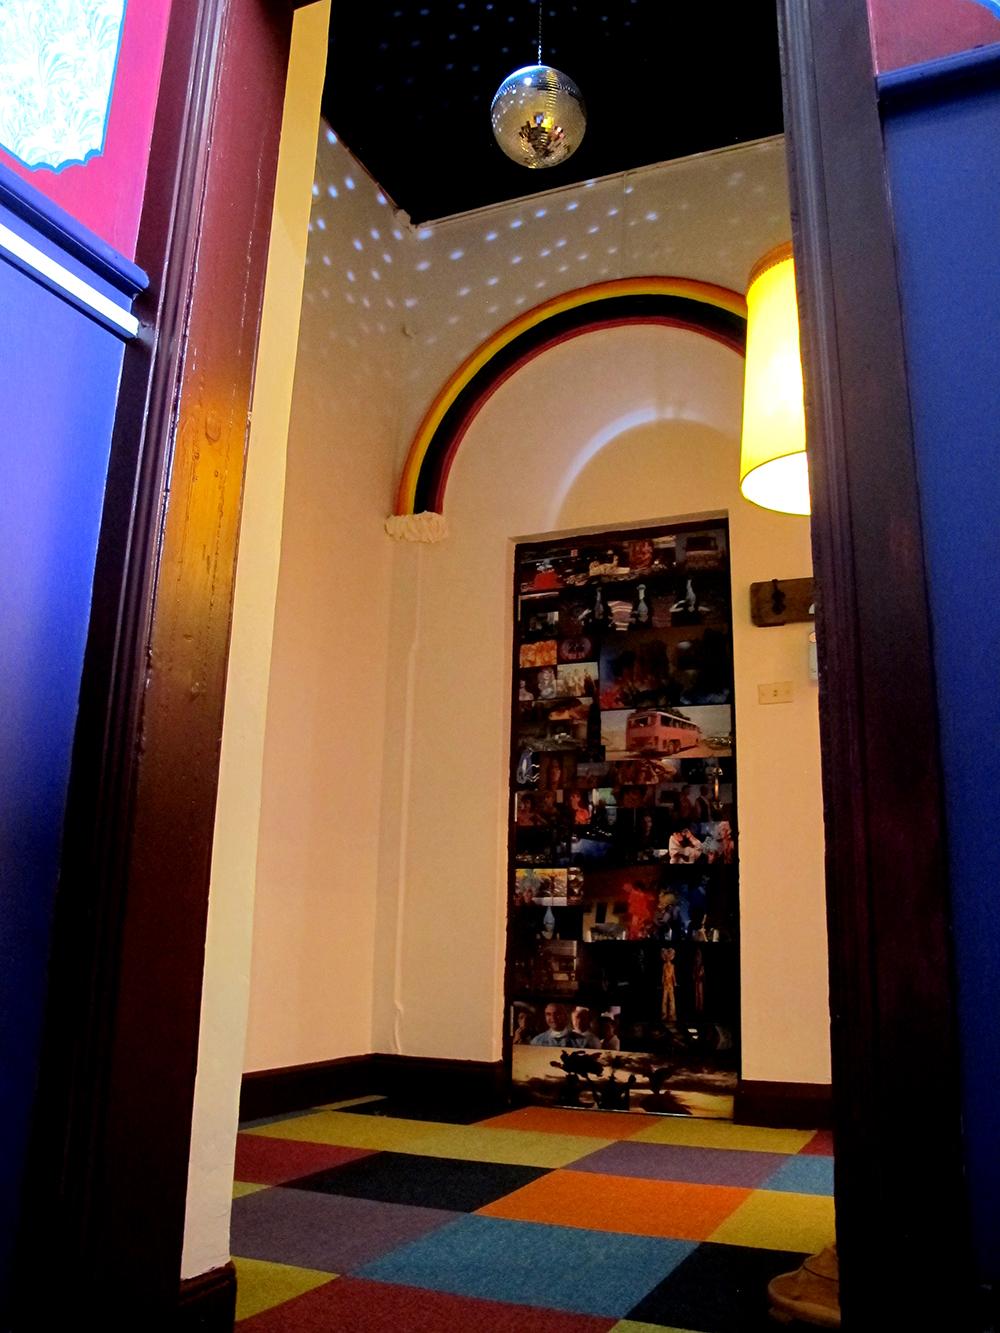 palace-hotel-priscilla-suite-mirrorball2.jpg